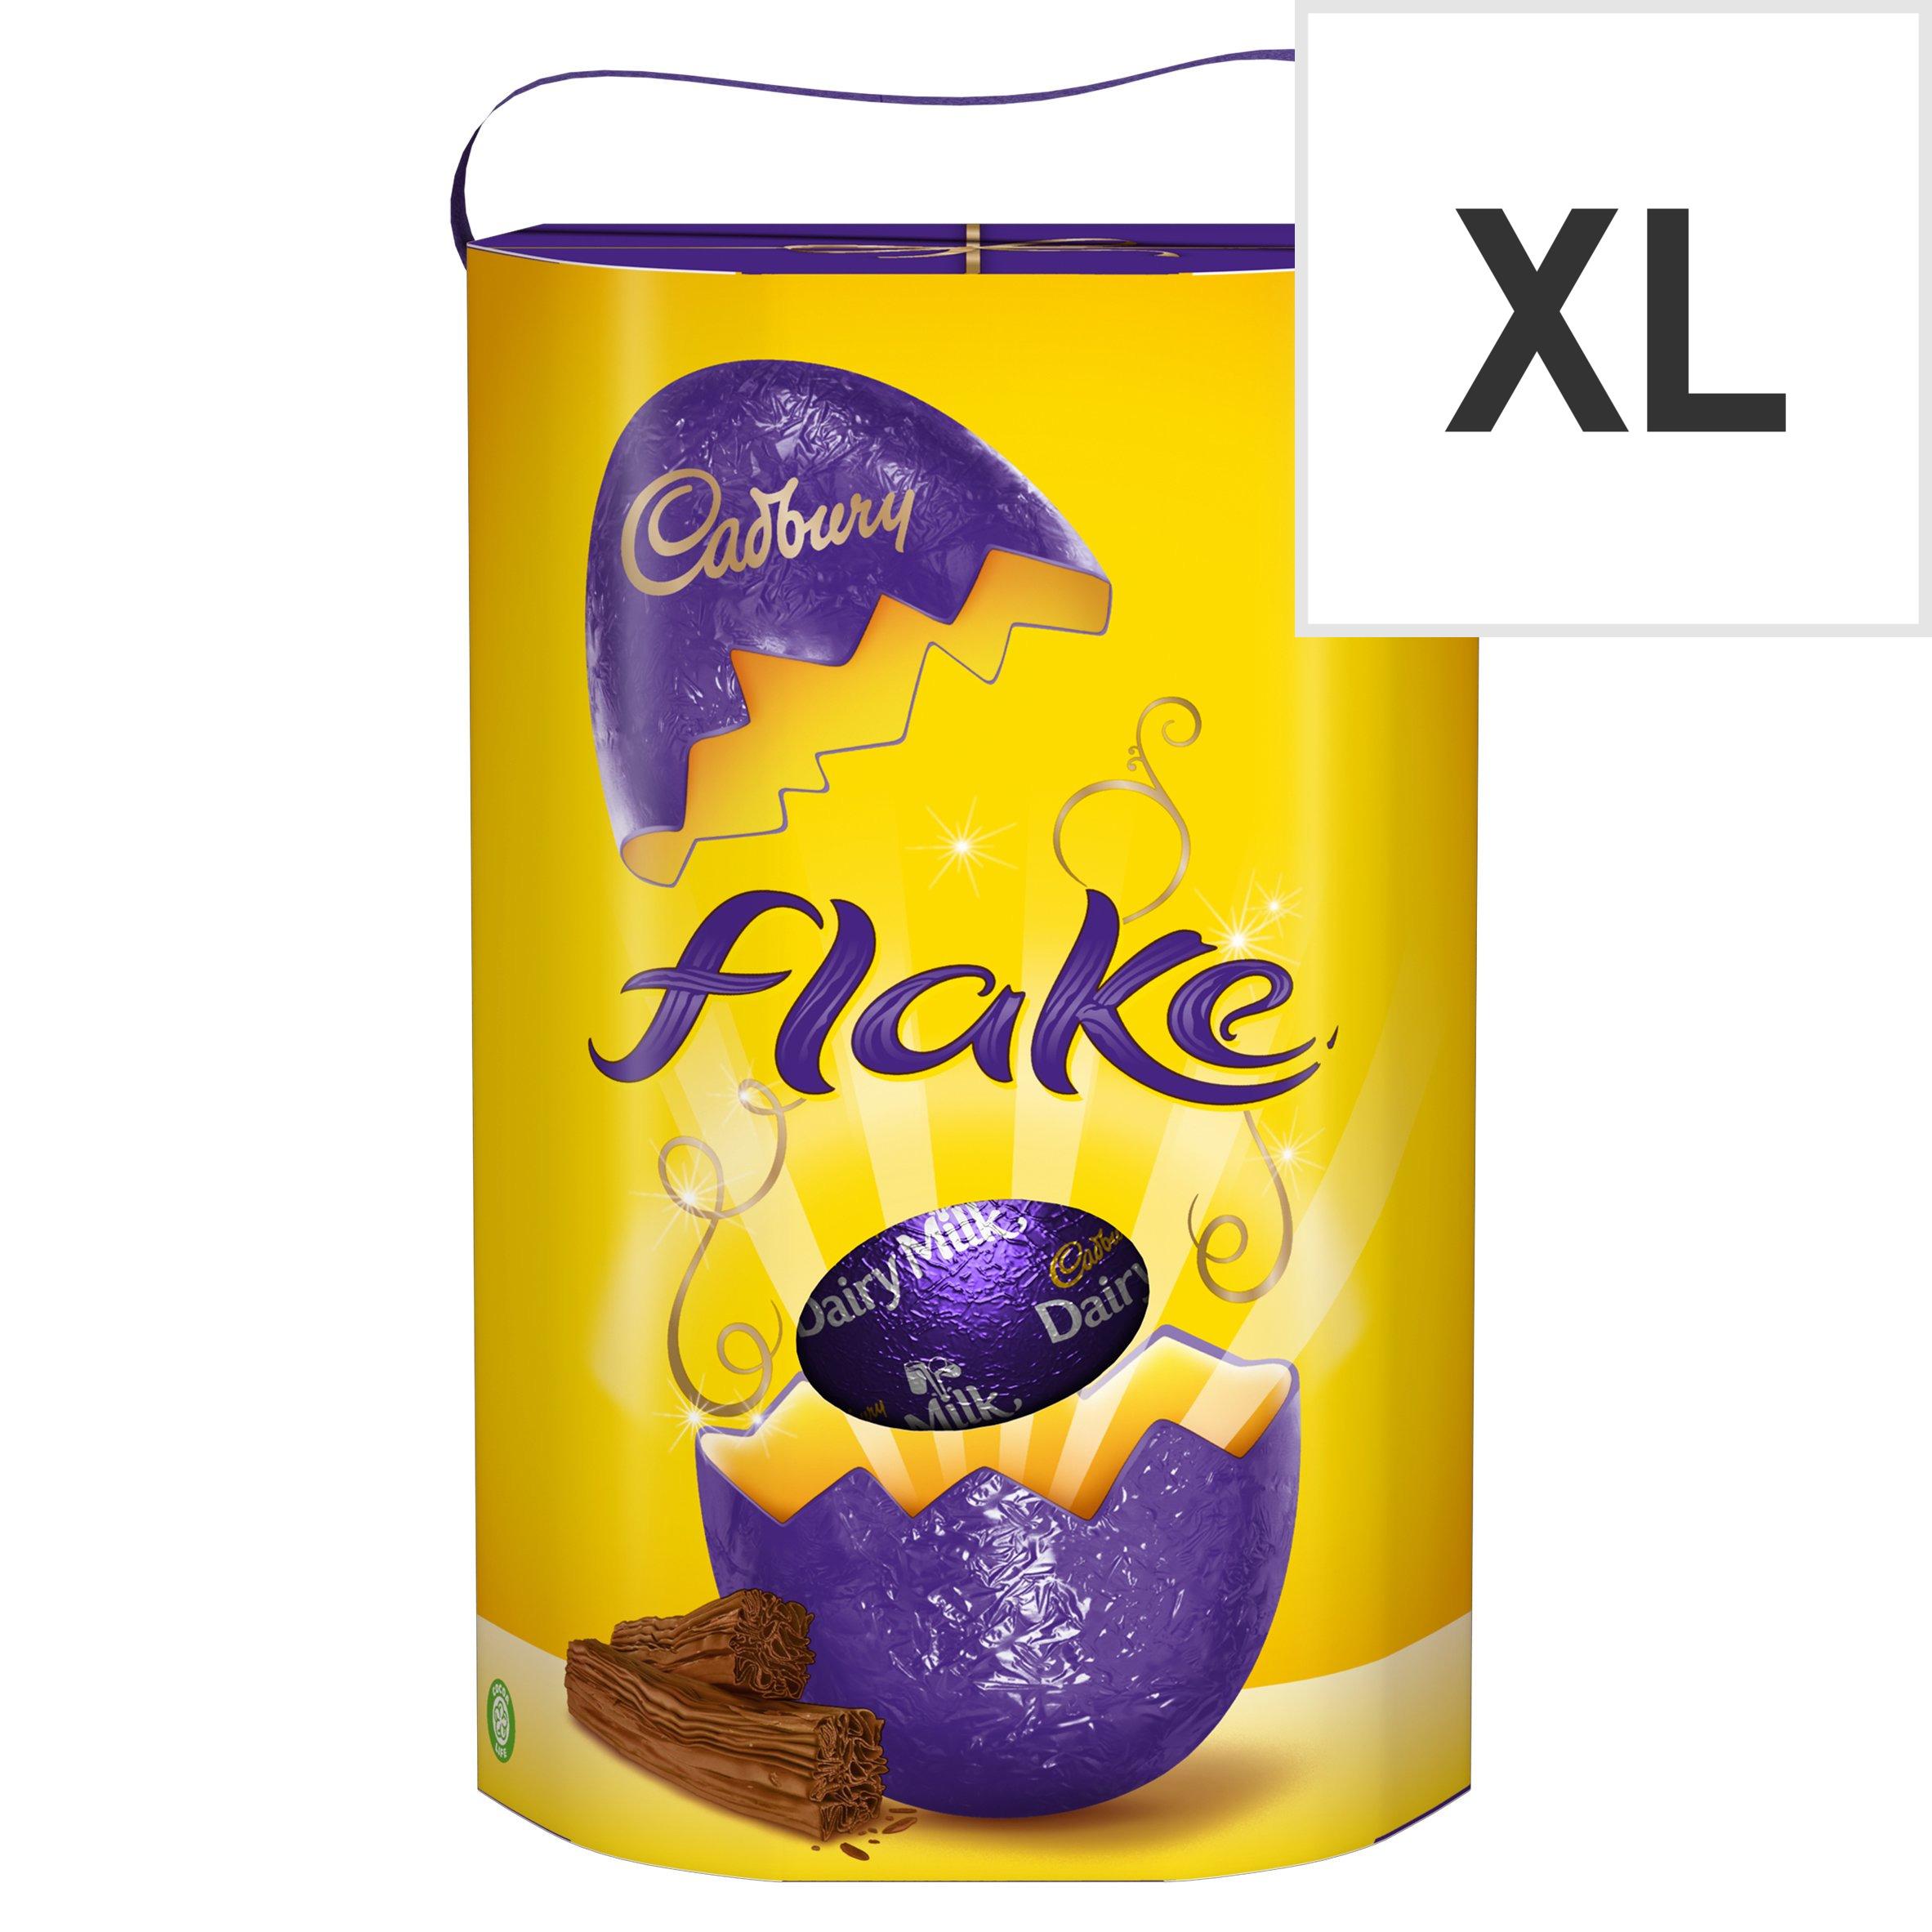 Cadbury Flake Easter Egg 249G